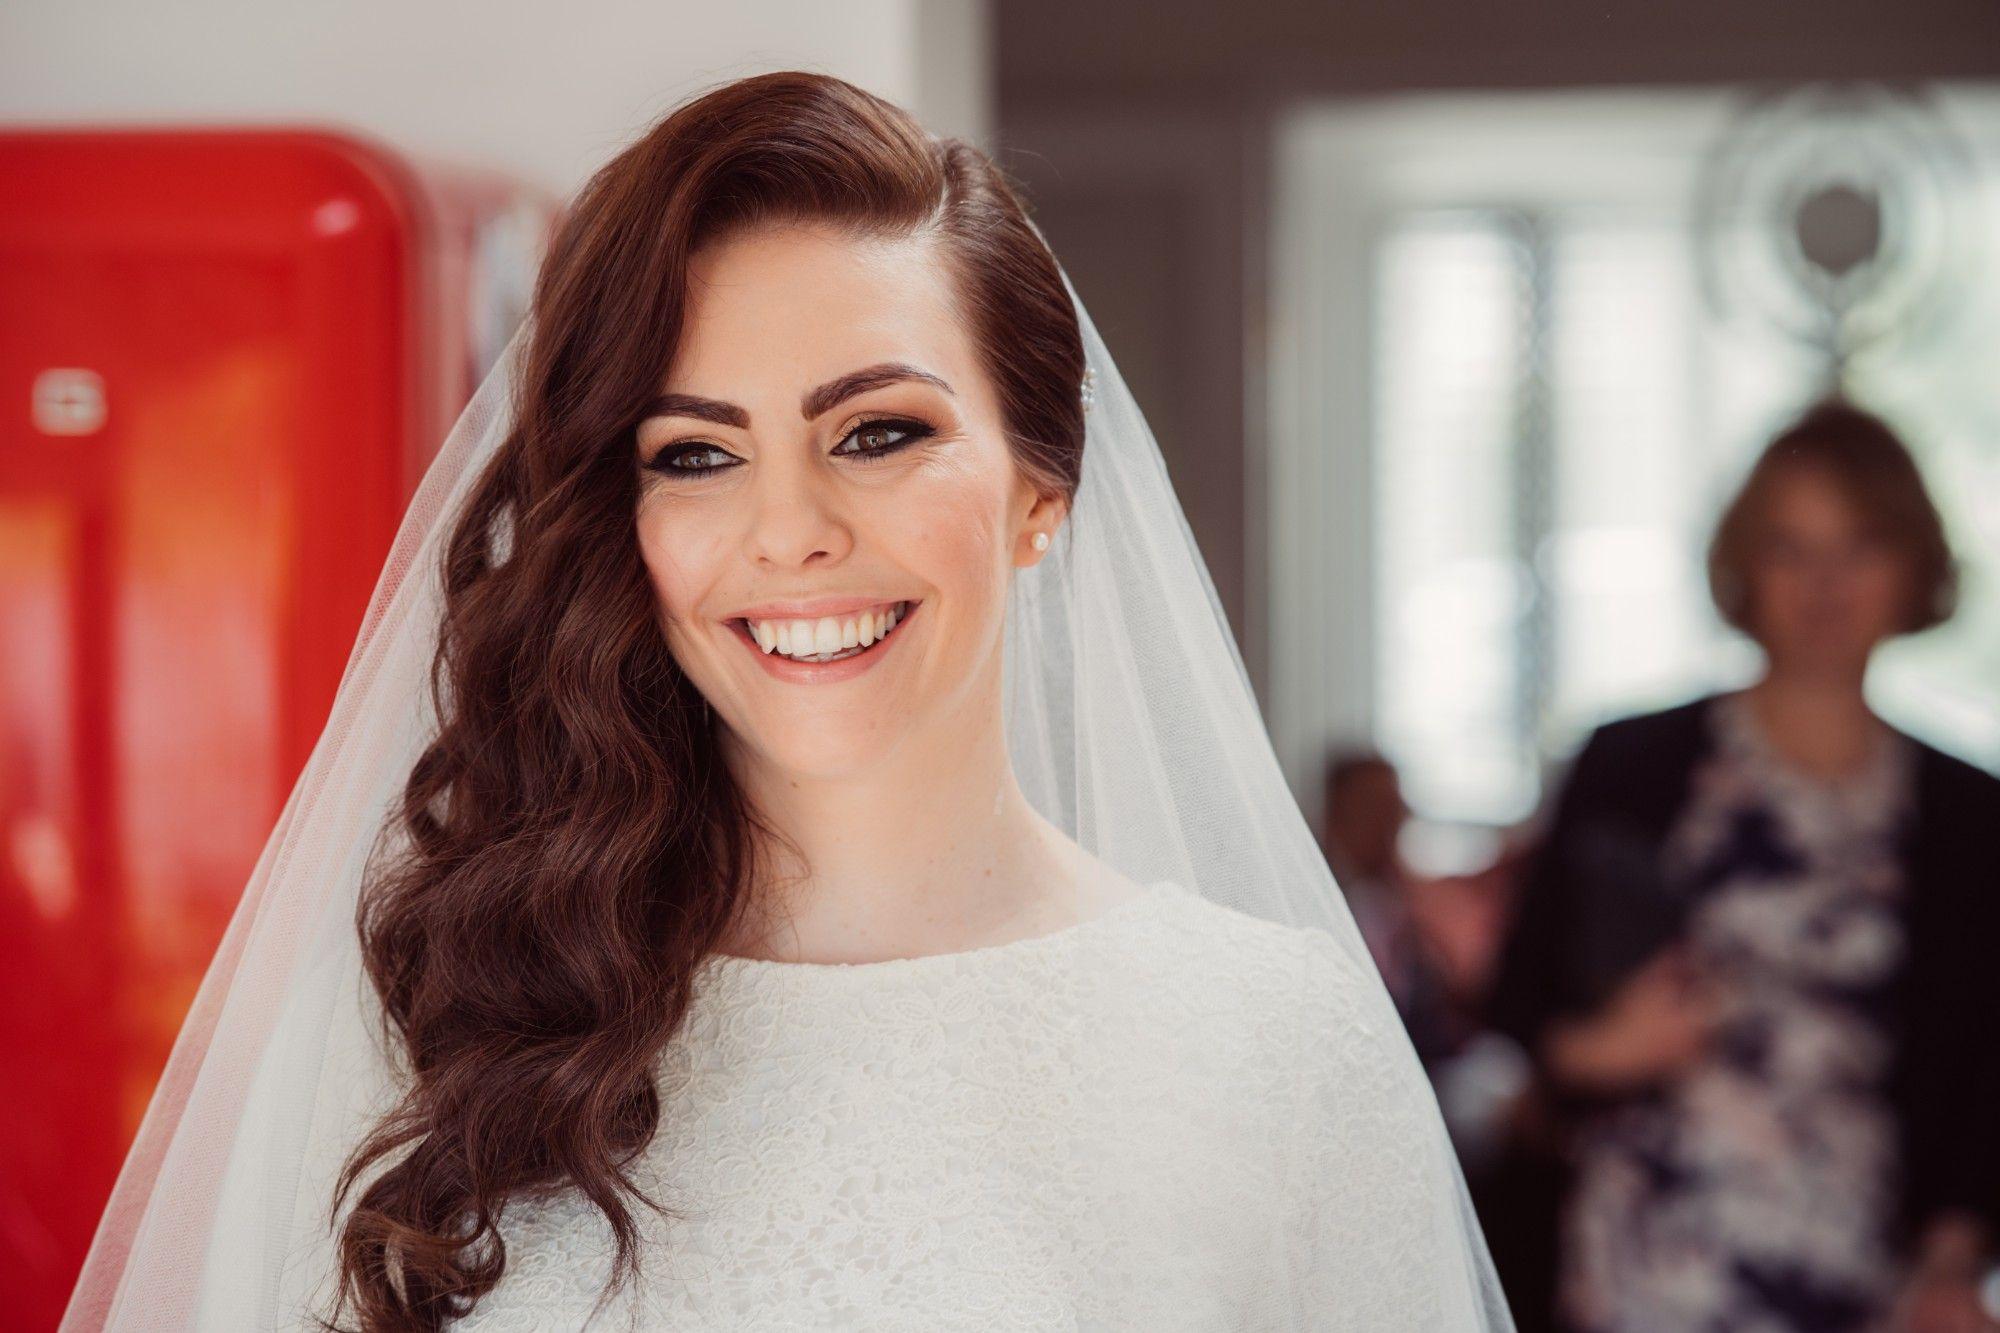 Bridal-wedding-hair-stylist-Tetbury-Gloucestershire-UK-LL-75.jpg